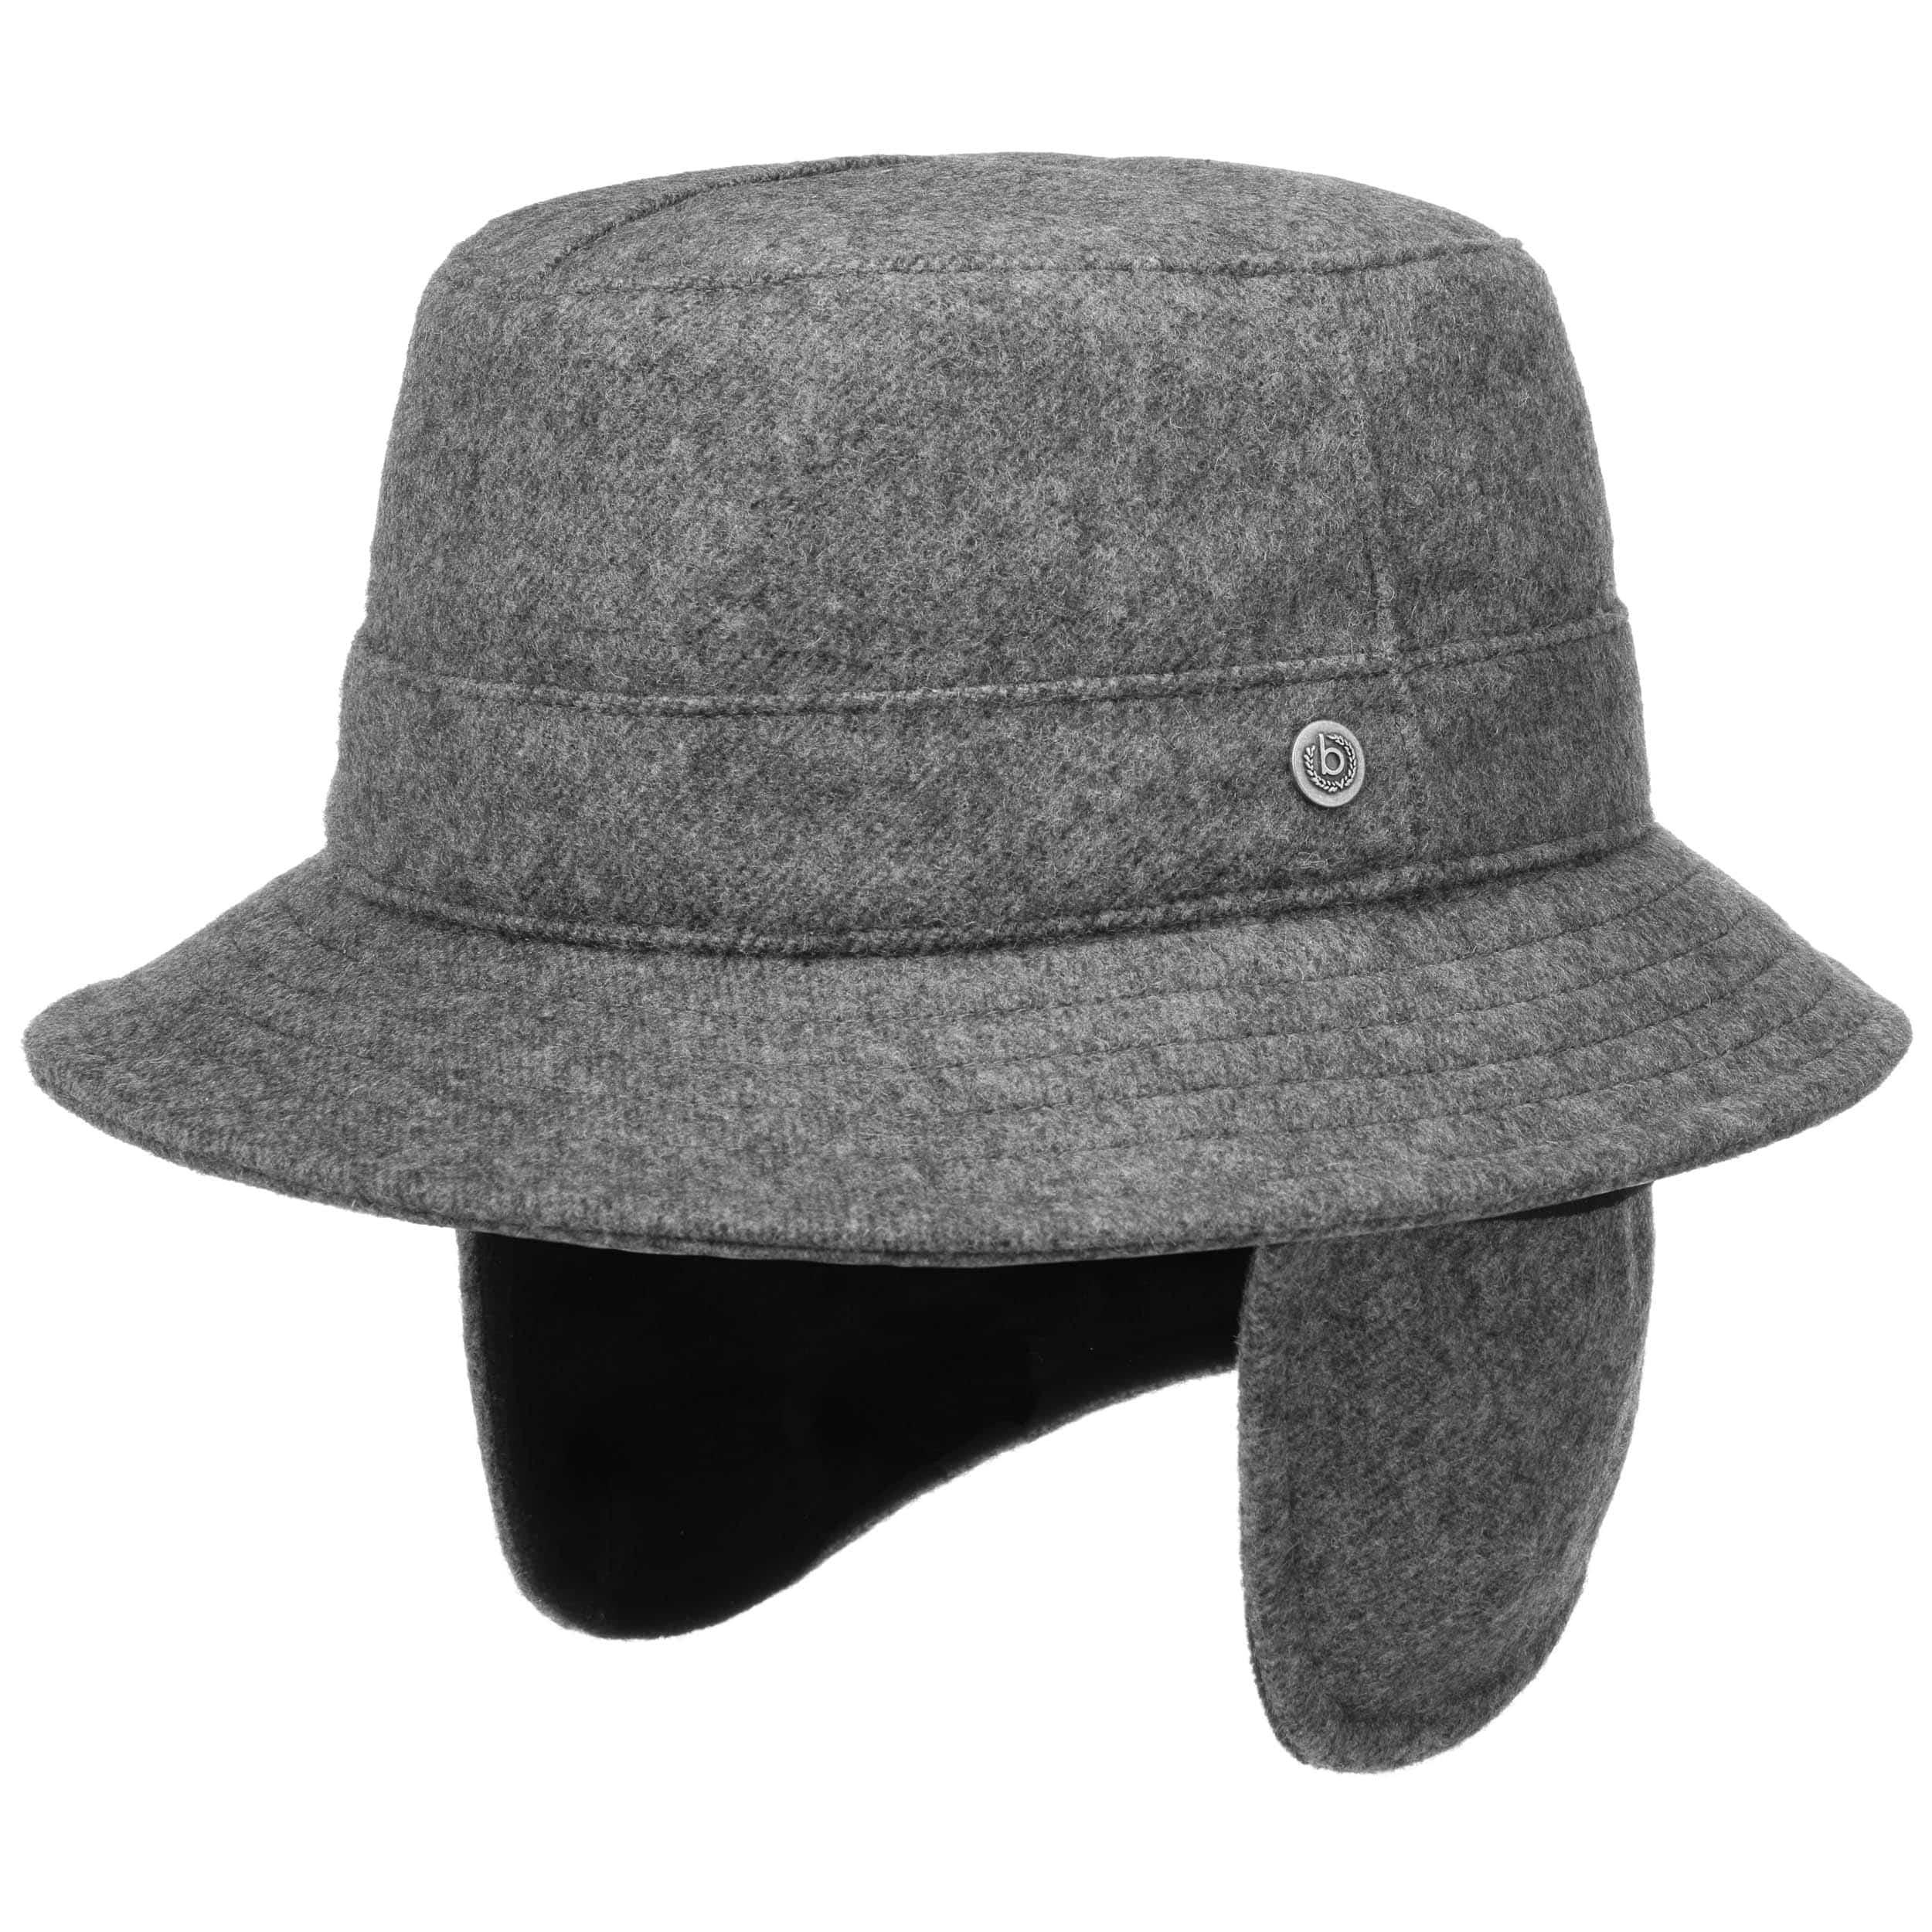 Sombrero Windstopper Earflaps by bugatti - Sombreros - sombreroshop.es 2eaf09e61e3